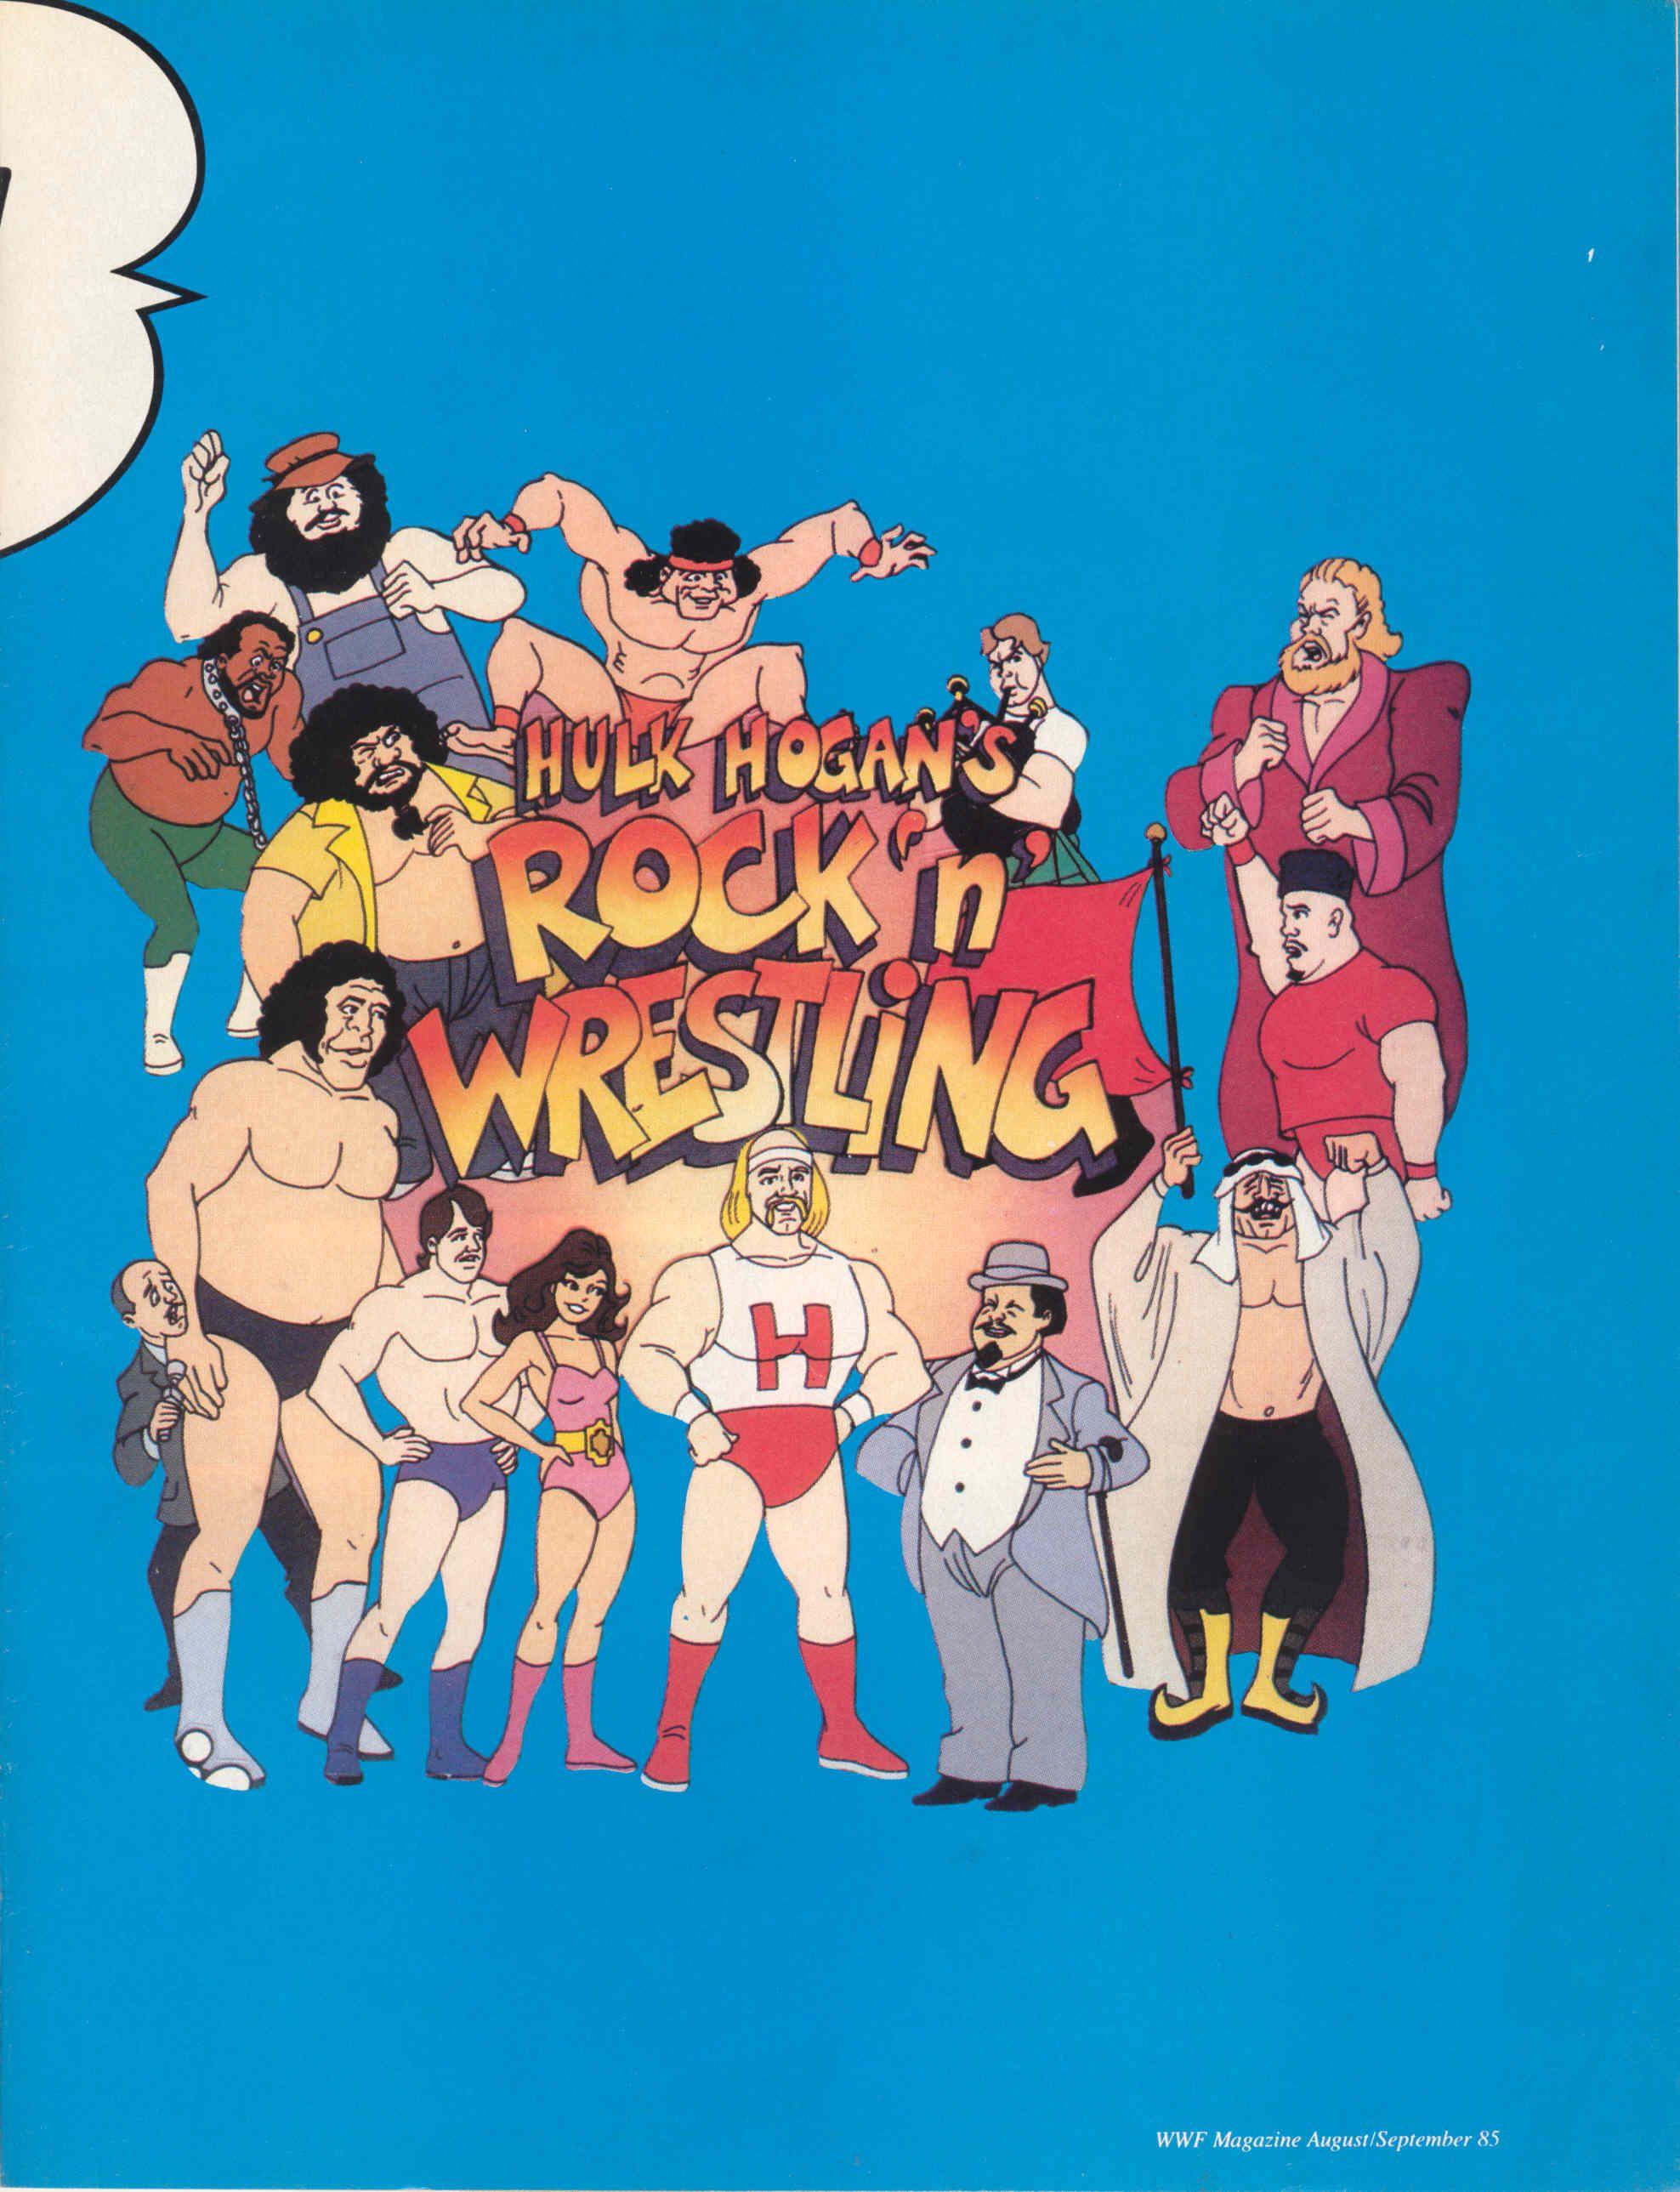 Little boy dressed as professional wrestler cartoon clipart vector royalty free download Hulk Hogan\'s Rock N Wrestling cartoon   Wrestling   Hulk hogan ... vector royalty free download